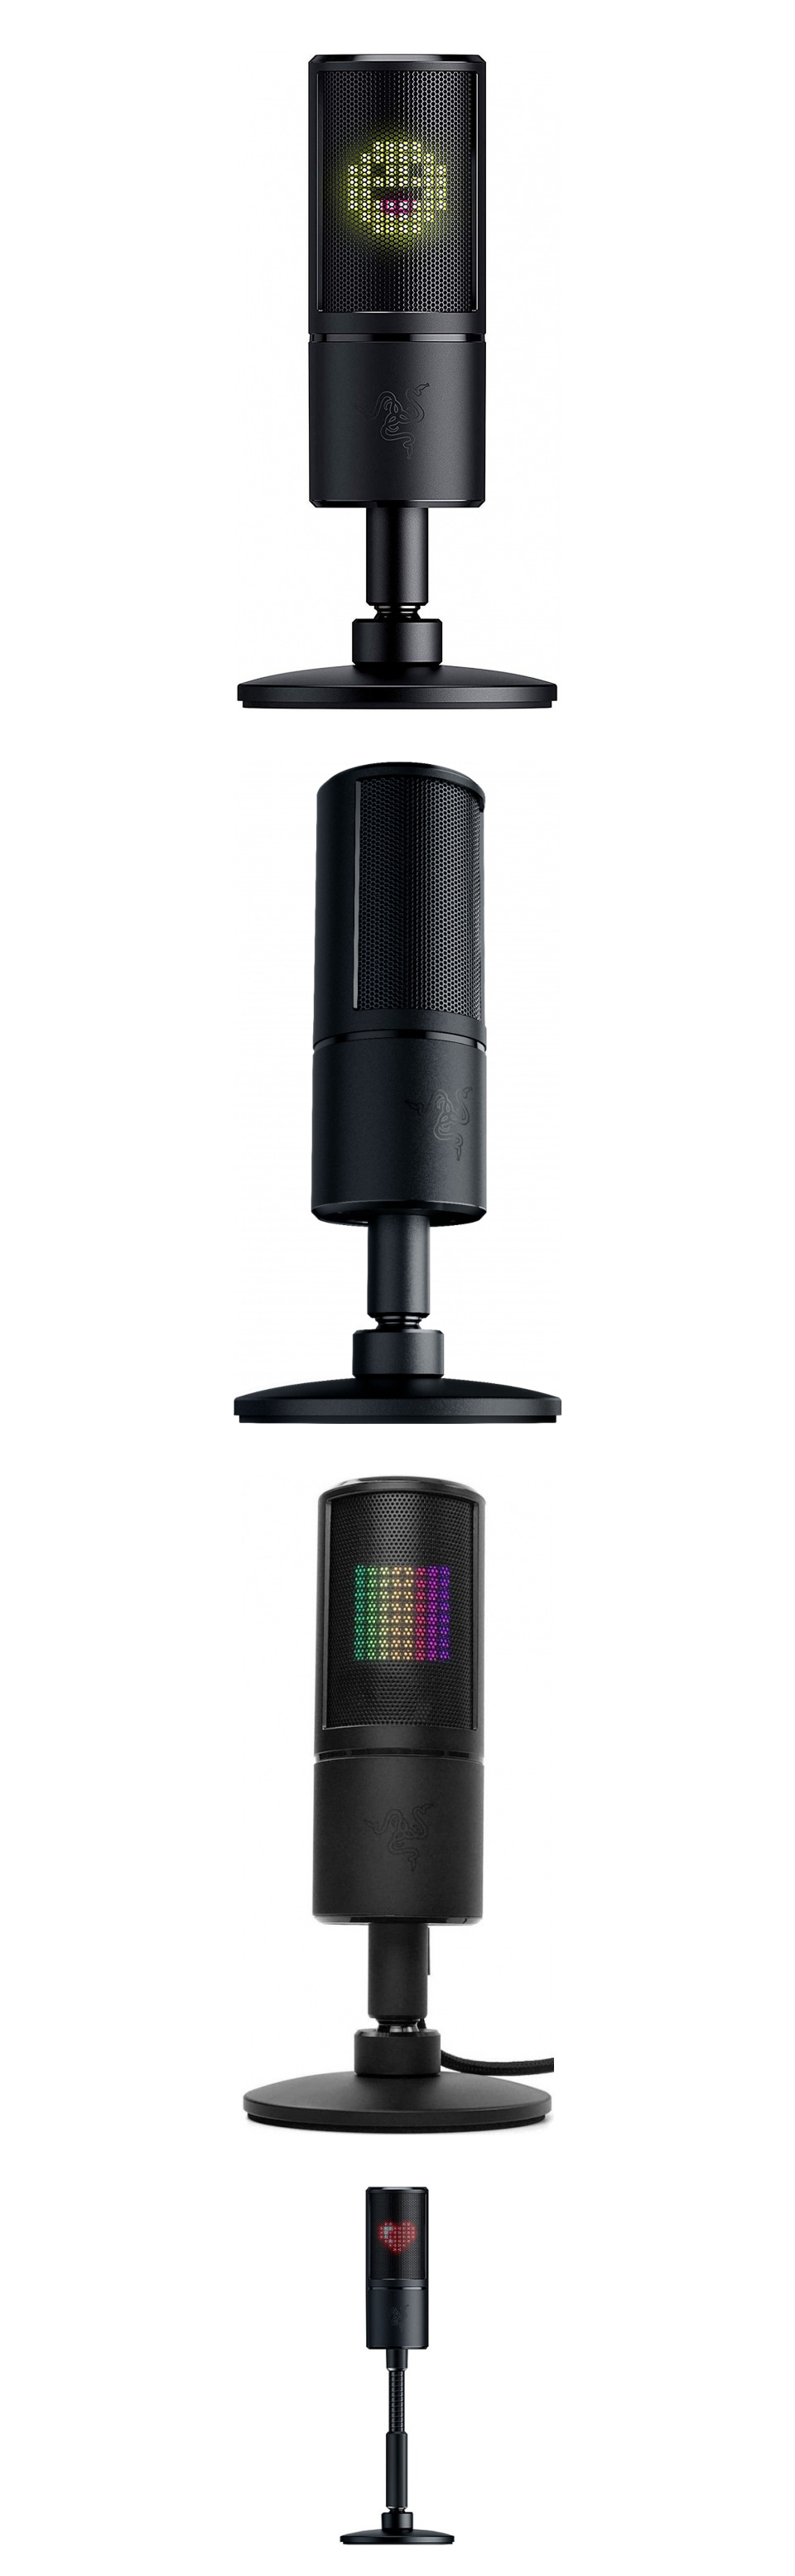 Razer Seiren Emote USB Desktop Microphone product